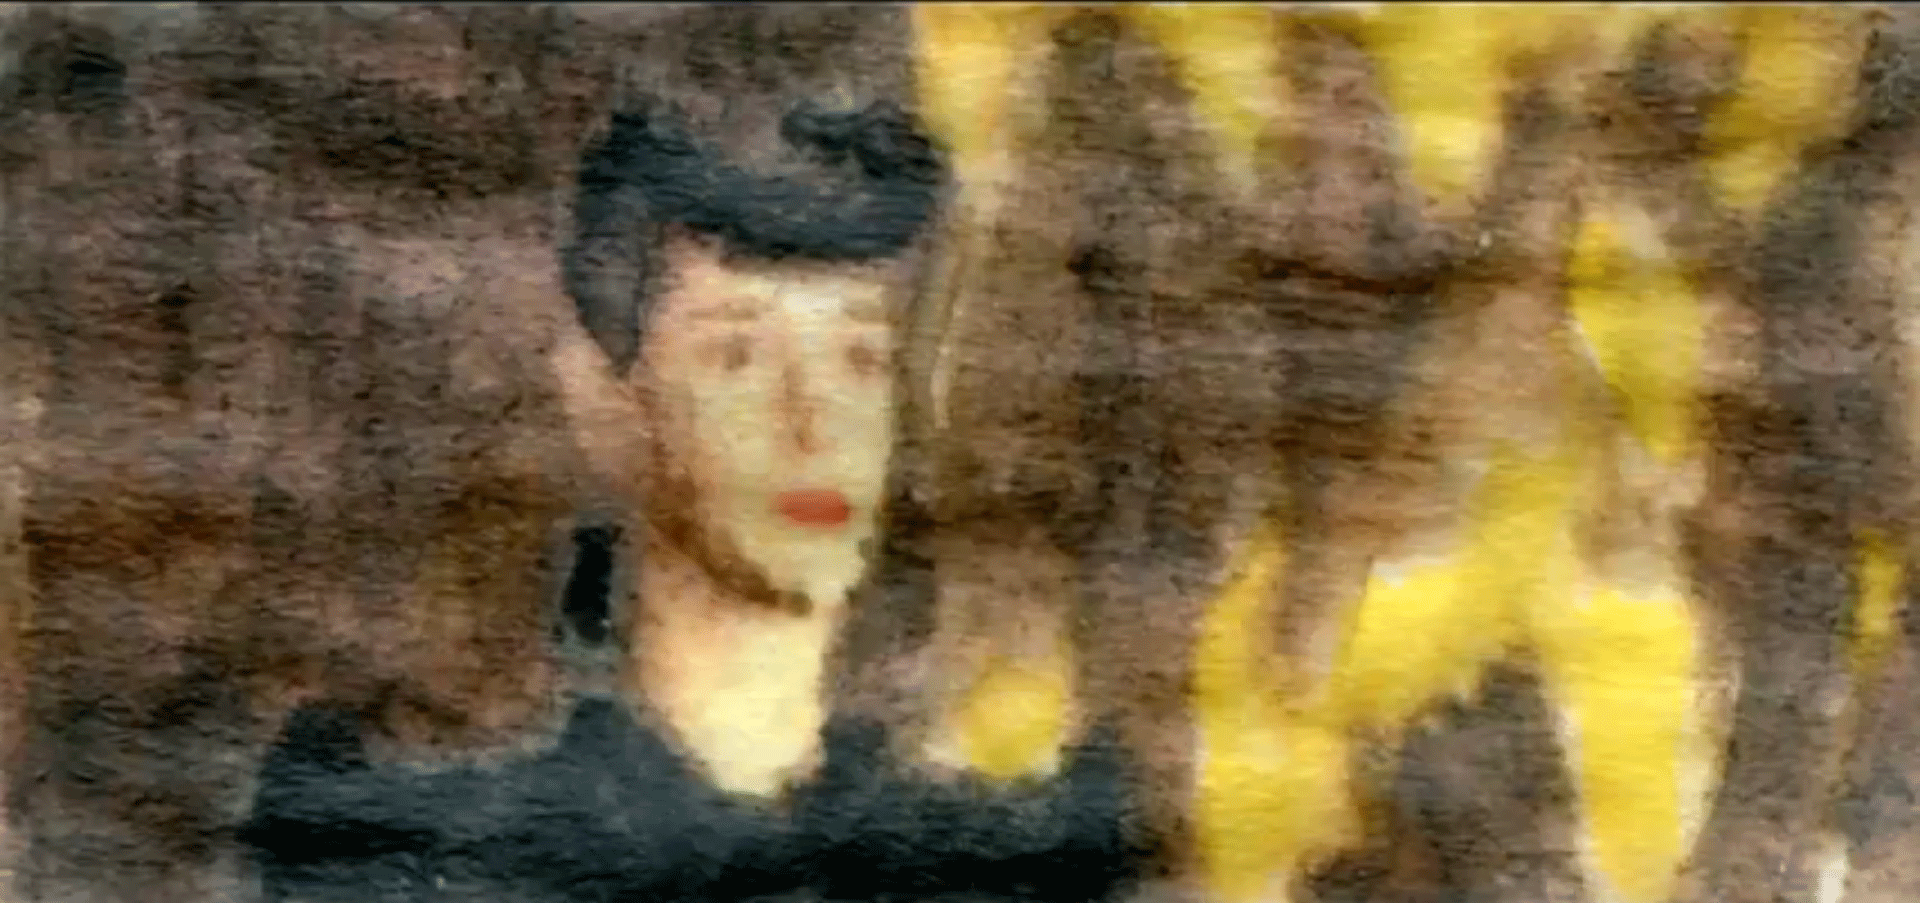 Blade Runner à l'aquarelle